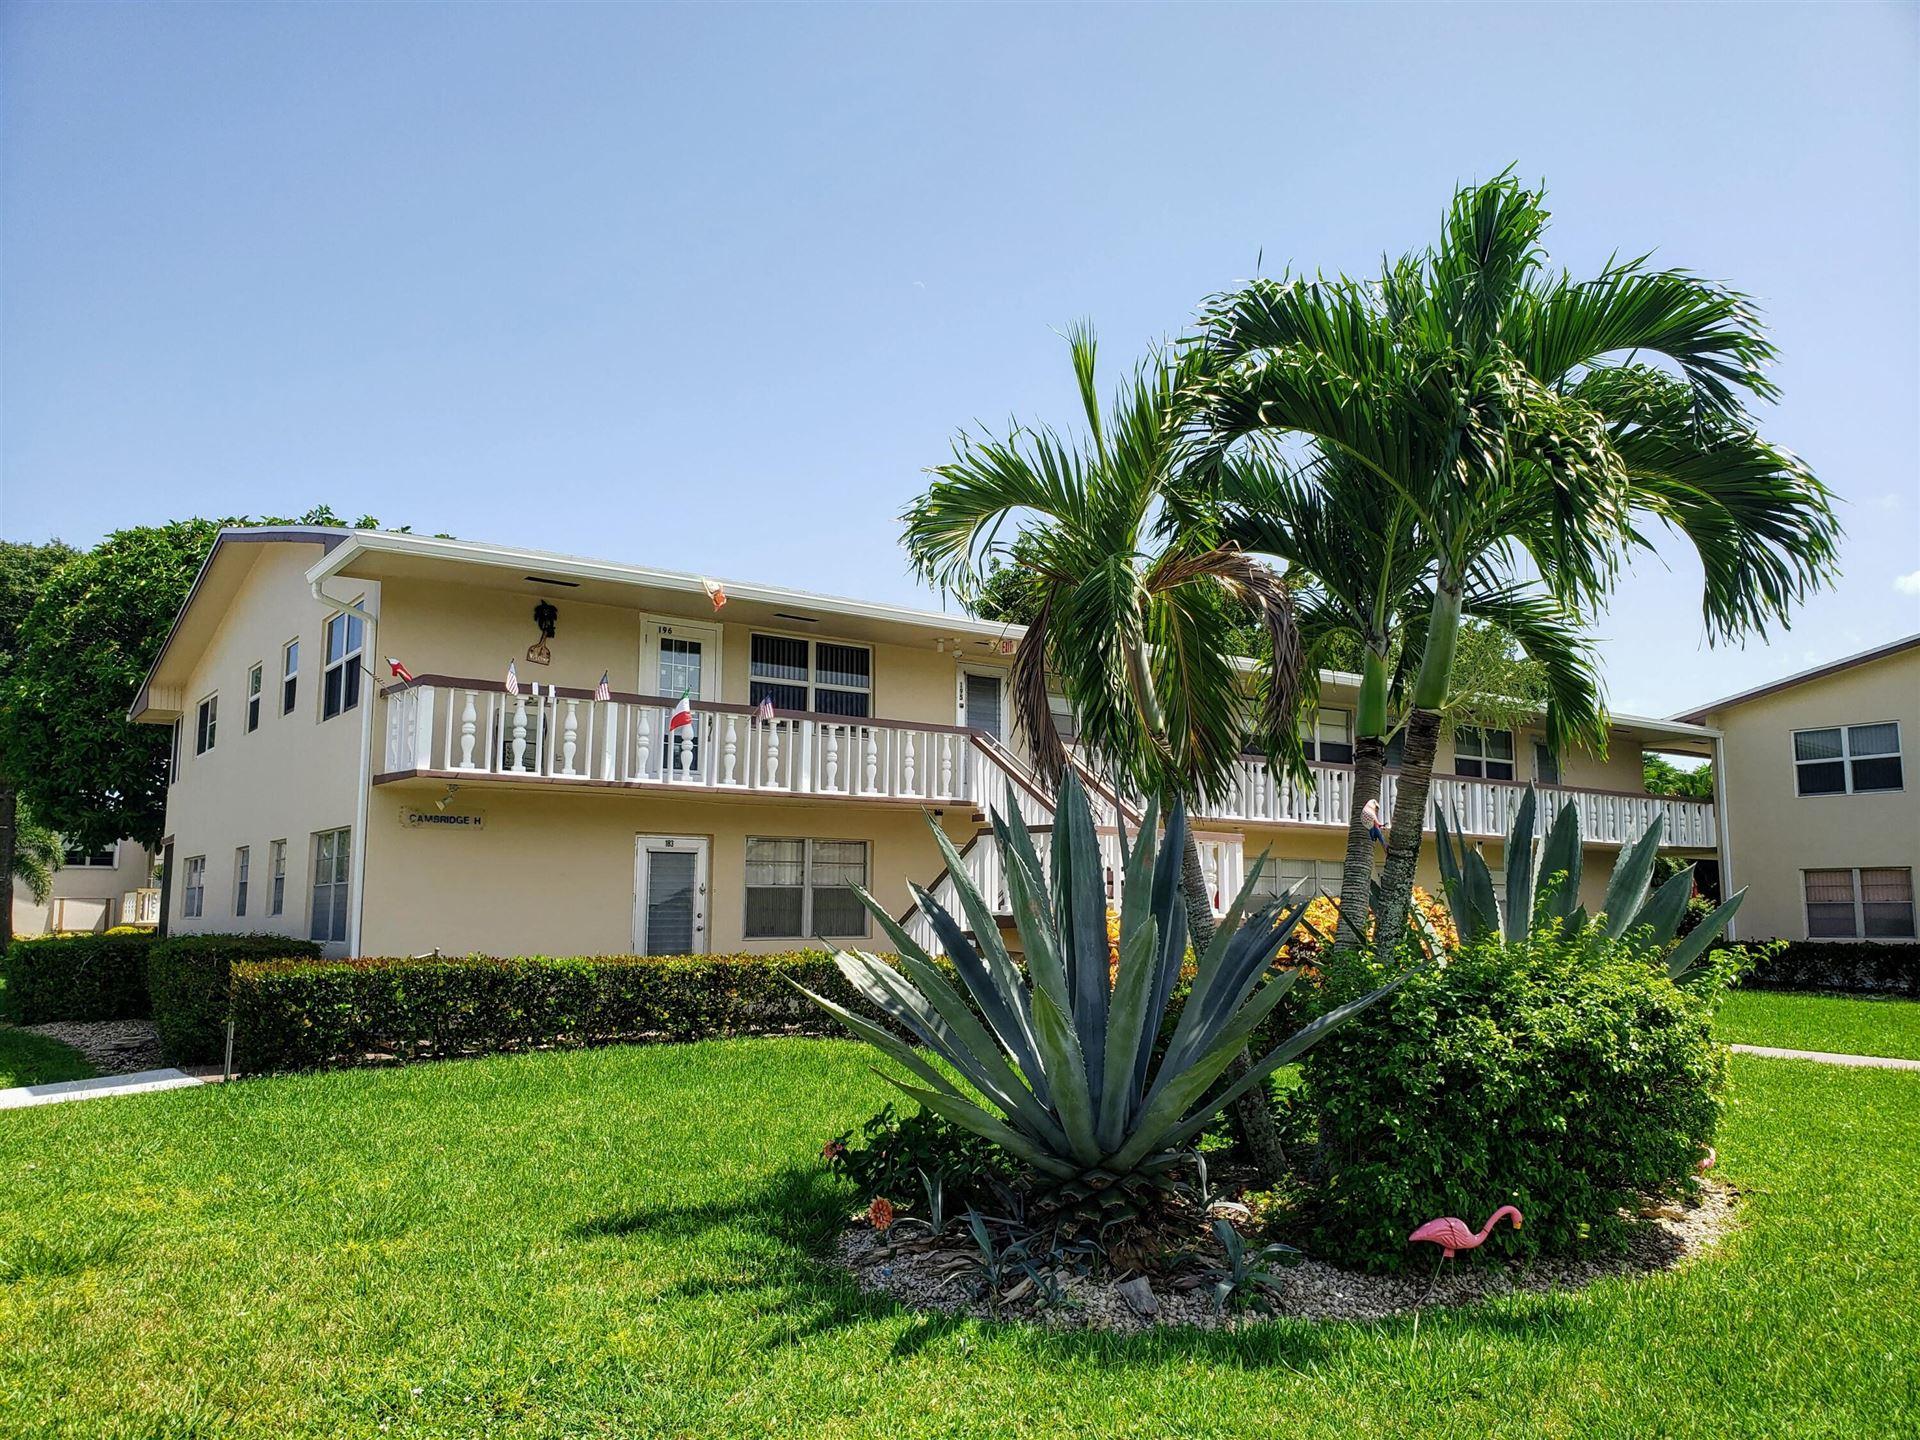 195 Cambridge H, West Palm Beach, FL 33417 - MLS#: RX-10744894